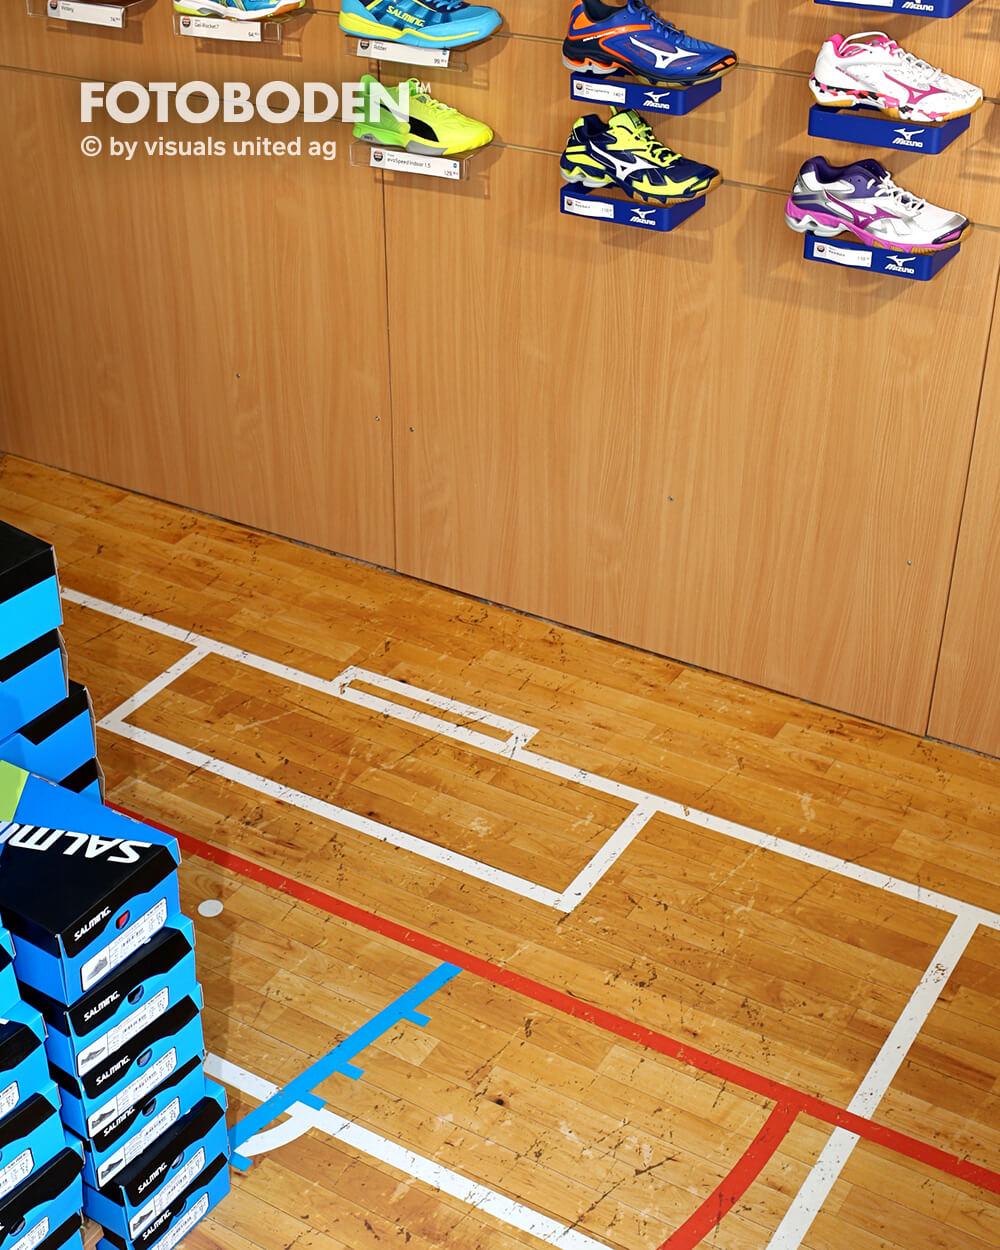 Sport5Ladenbau Ladengestaltung Fußboden Verkaufsfläche Bodengestaltung Boden Foto Fotoboden Fotomotiv Motiv Druck Visual Merchandising Point Of Sale POS